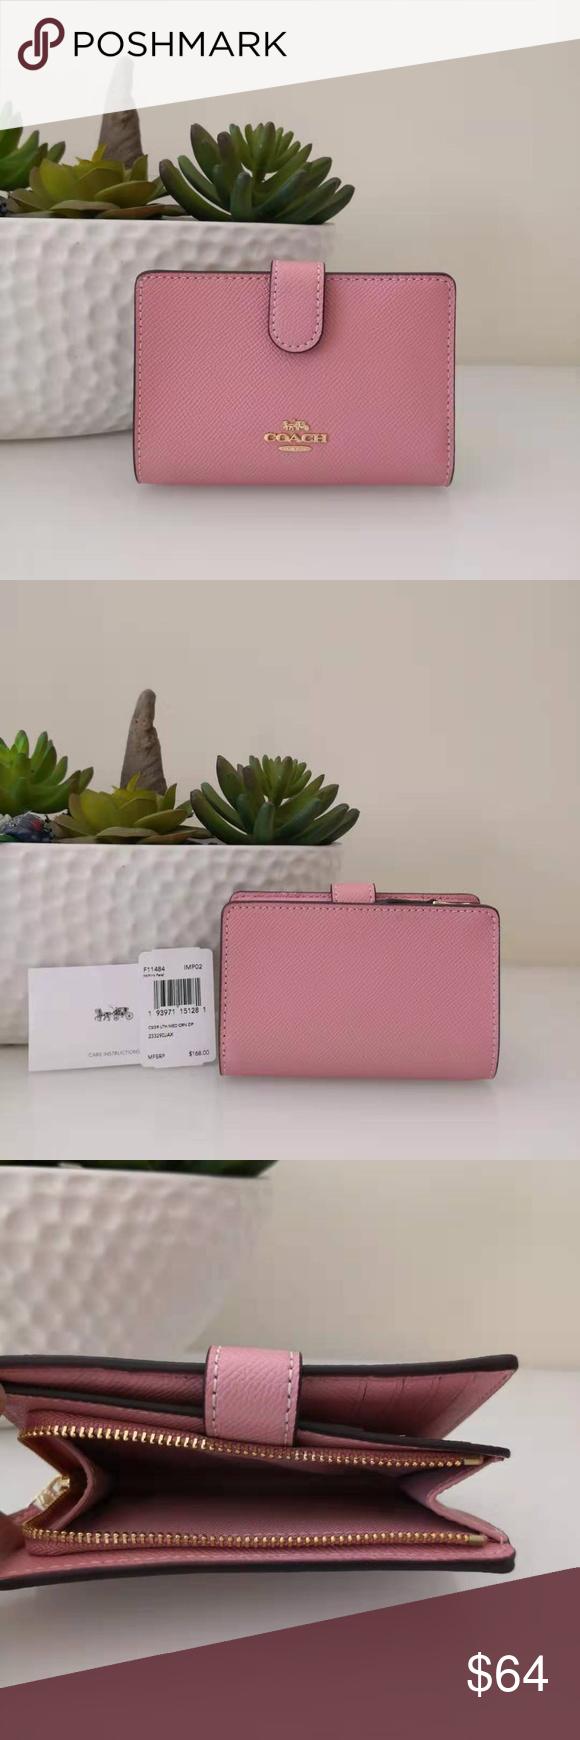 NWT Coach F11484 Medium Corner Zip Wallet in Crossgrain Leather Pink Petal